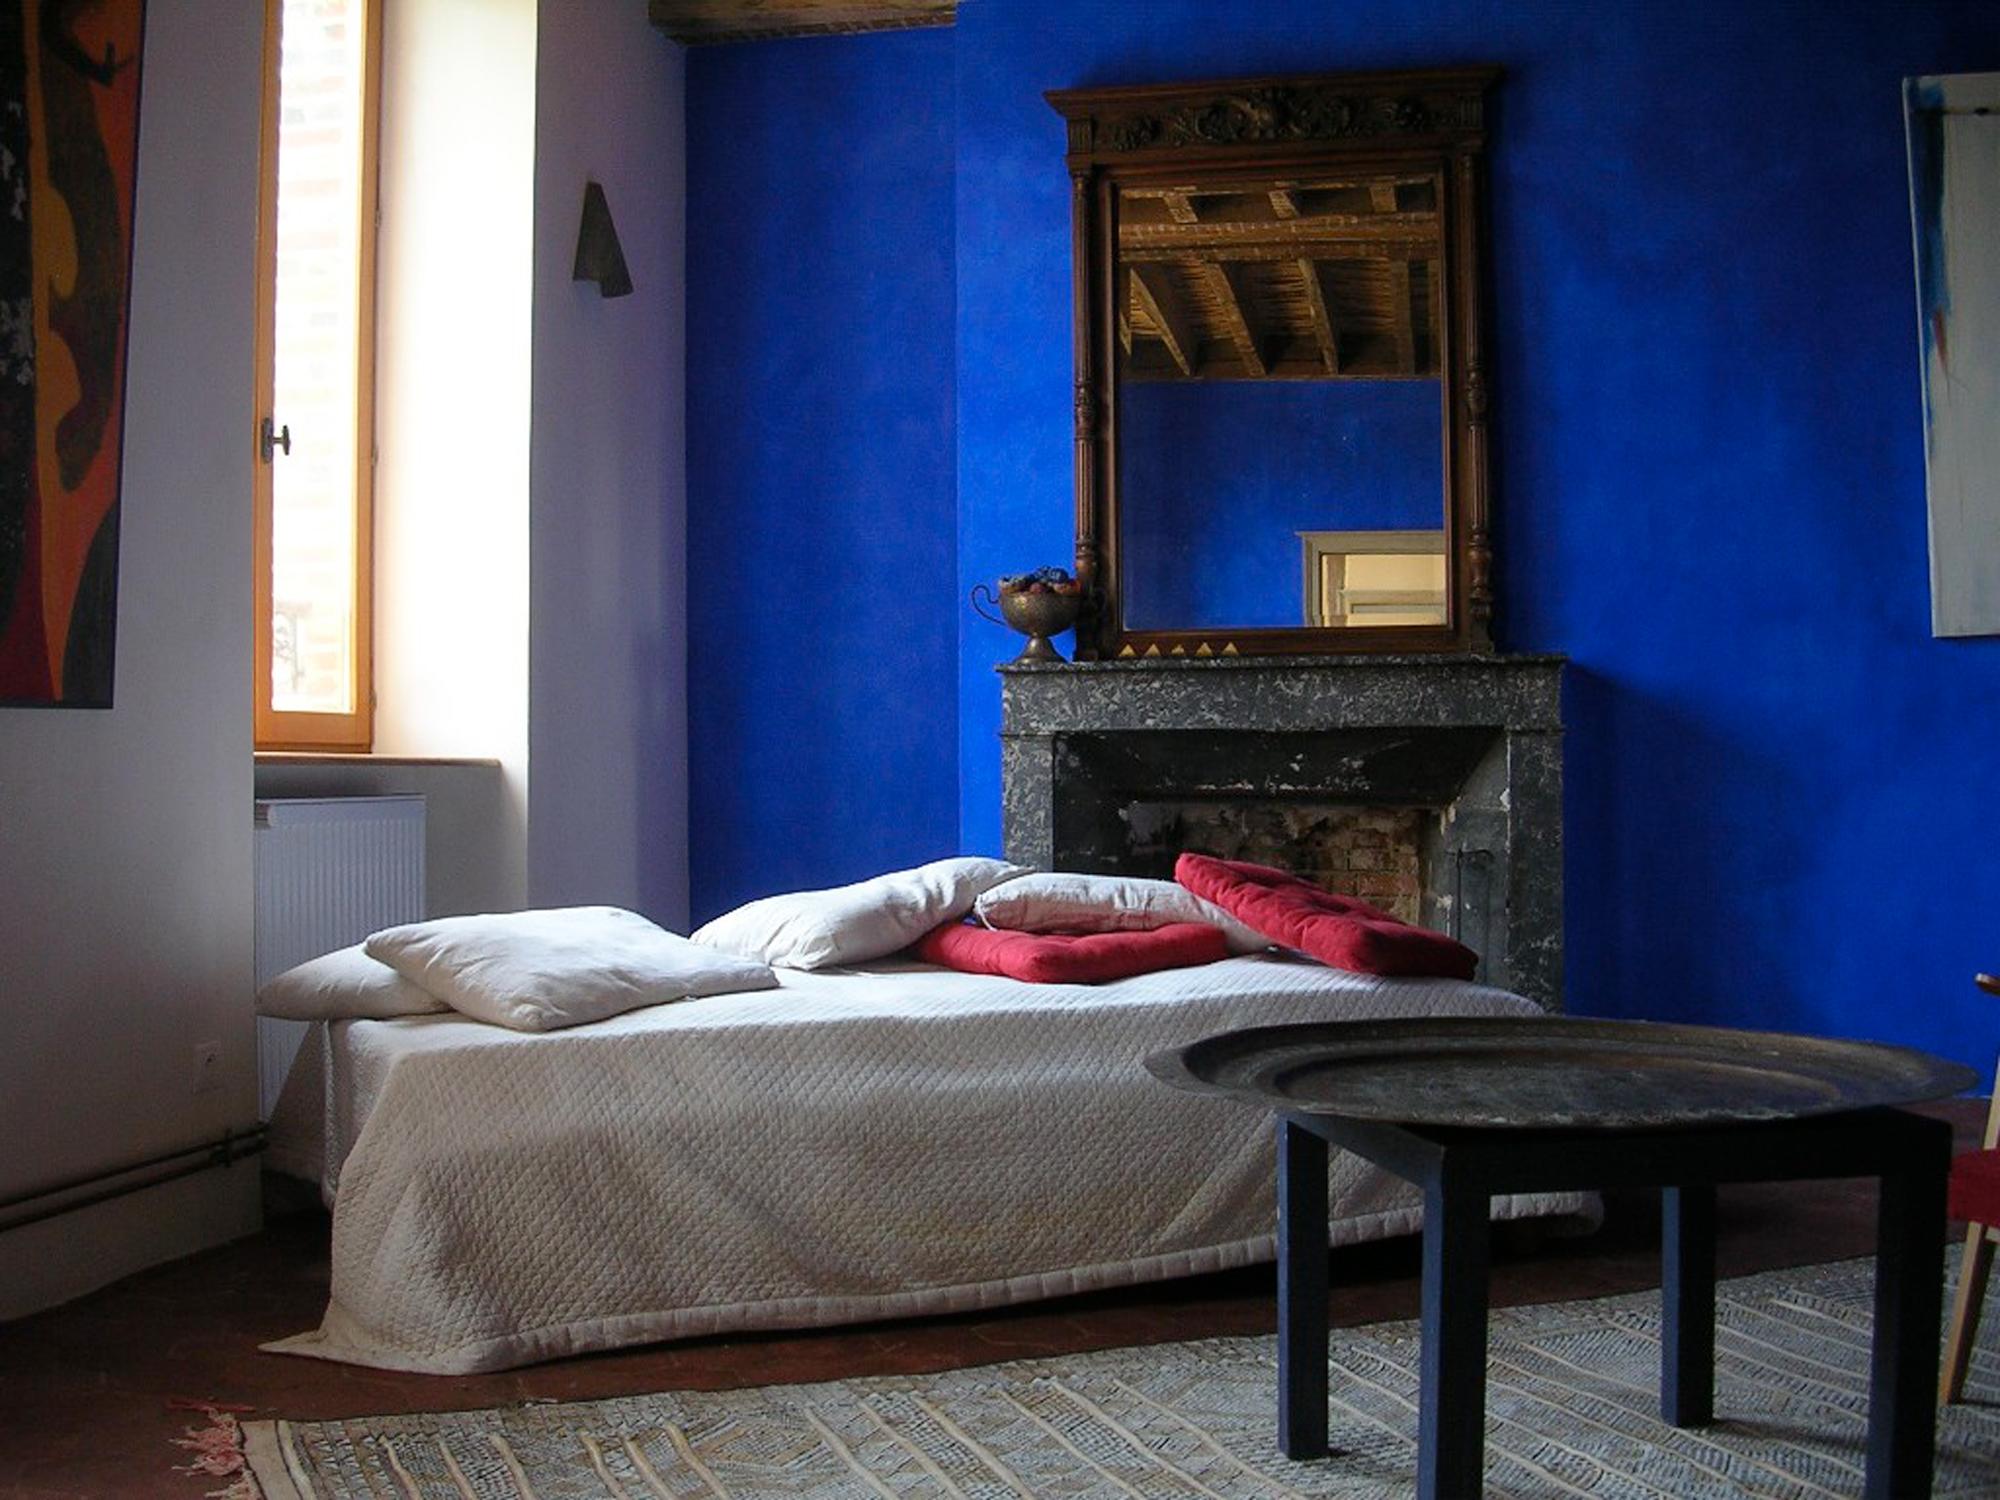 chambre bleue réaménagée